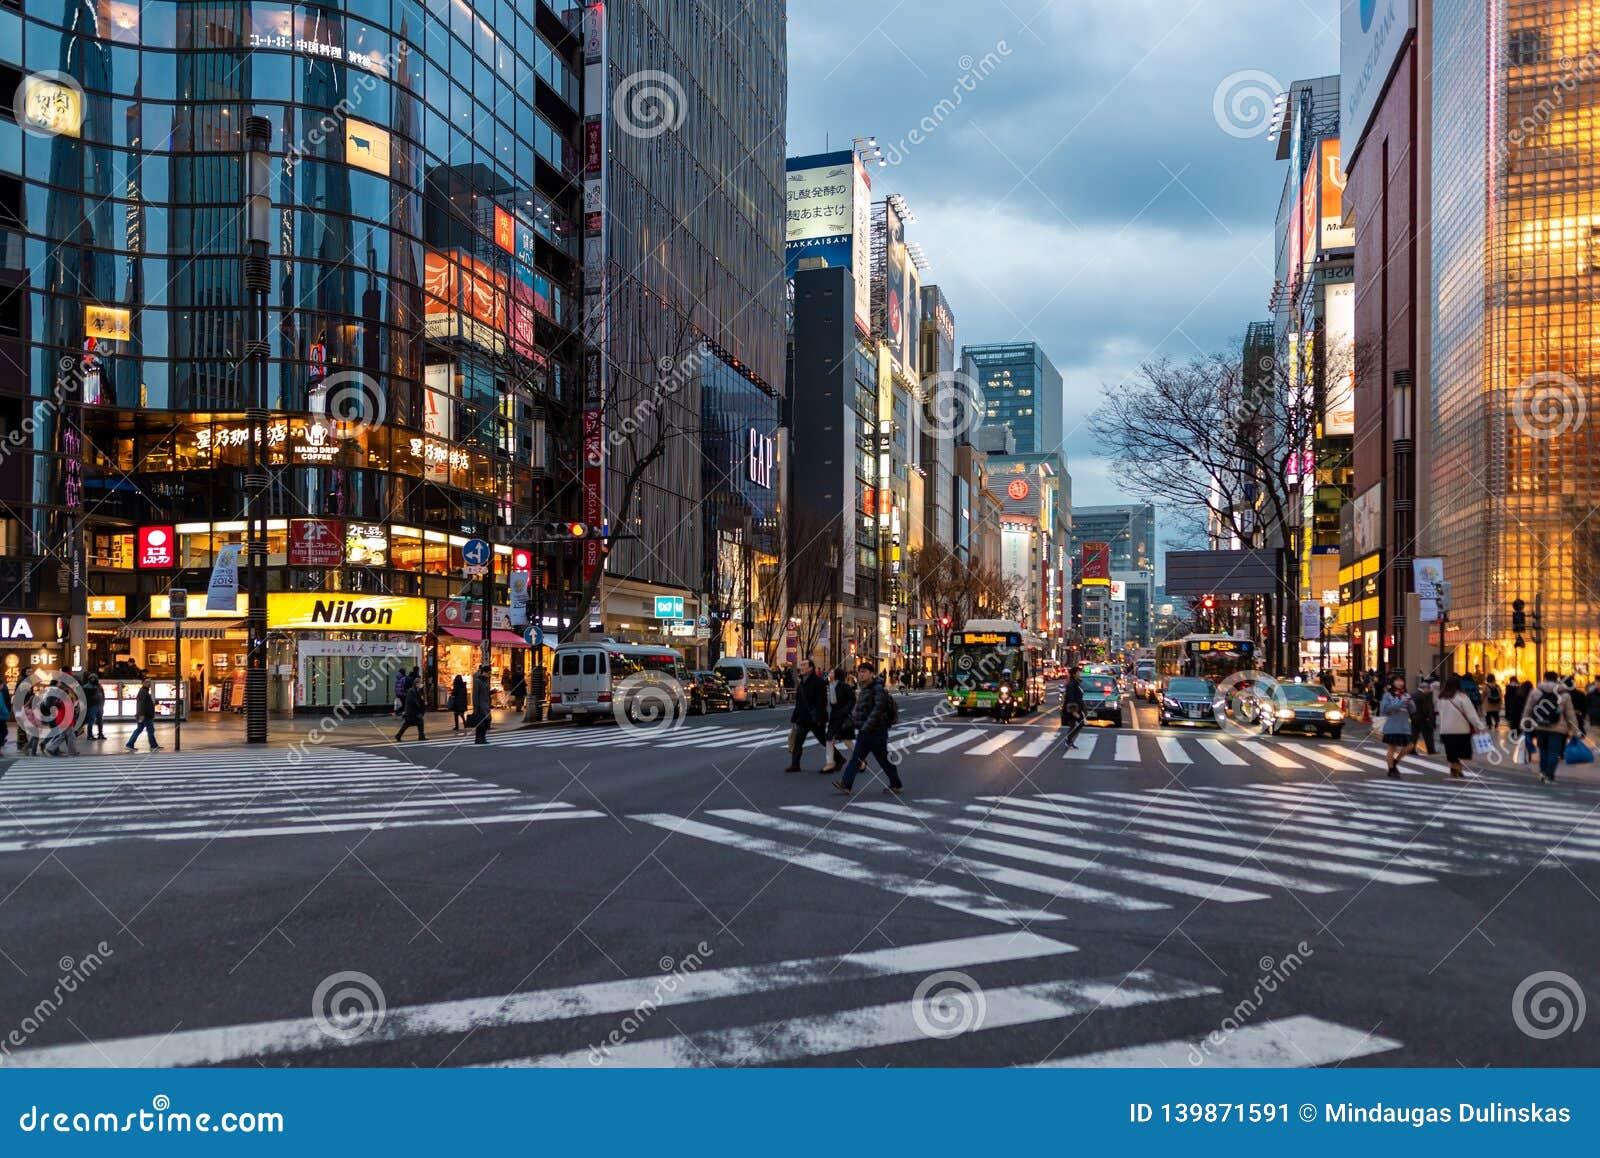 TOKYO, JAPAN - FEBRUARY 5, 2019: Tokyo Ginza Area Cityscape. Evening Photo. Japan